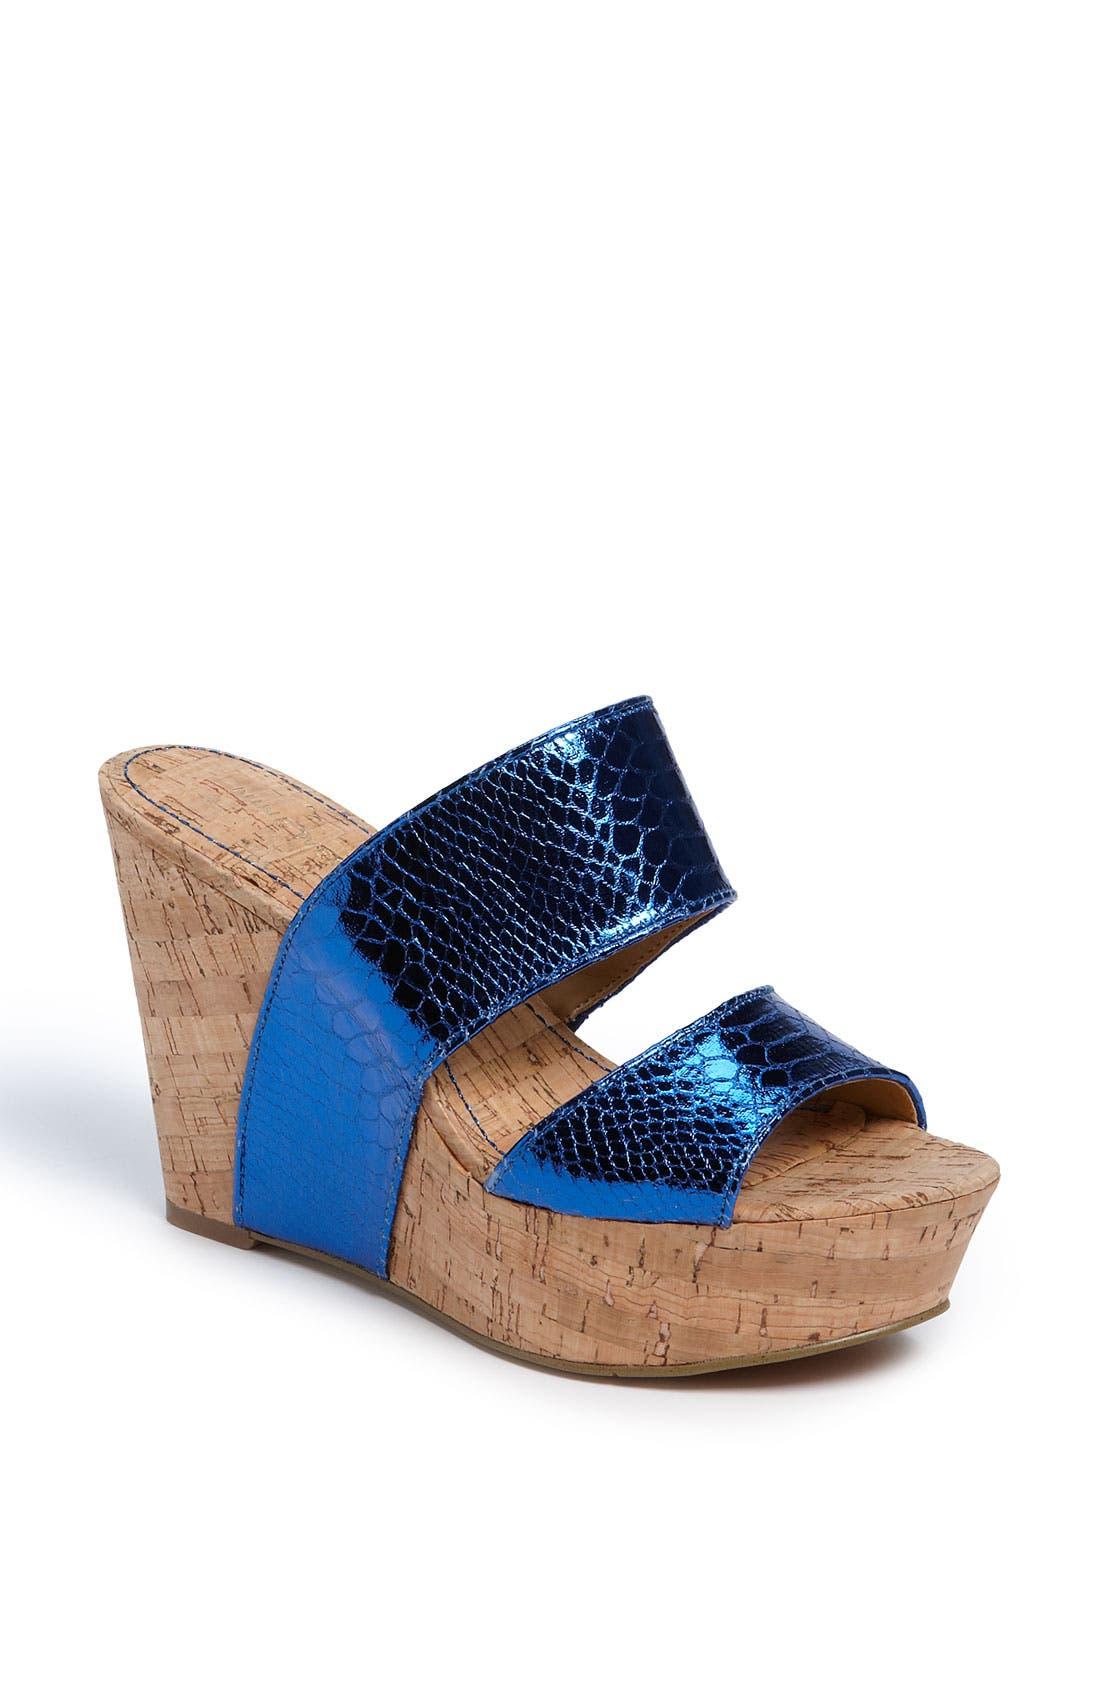 Main Image - Nine West 'Larysa' Wedge Sandal